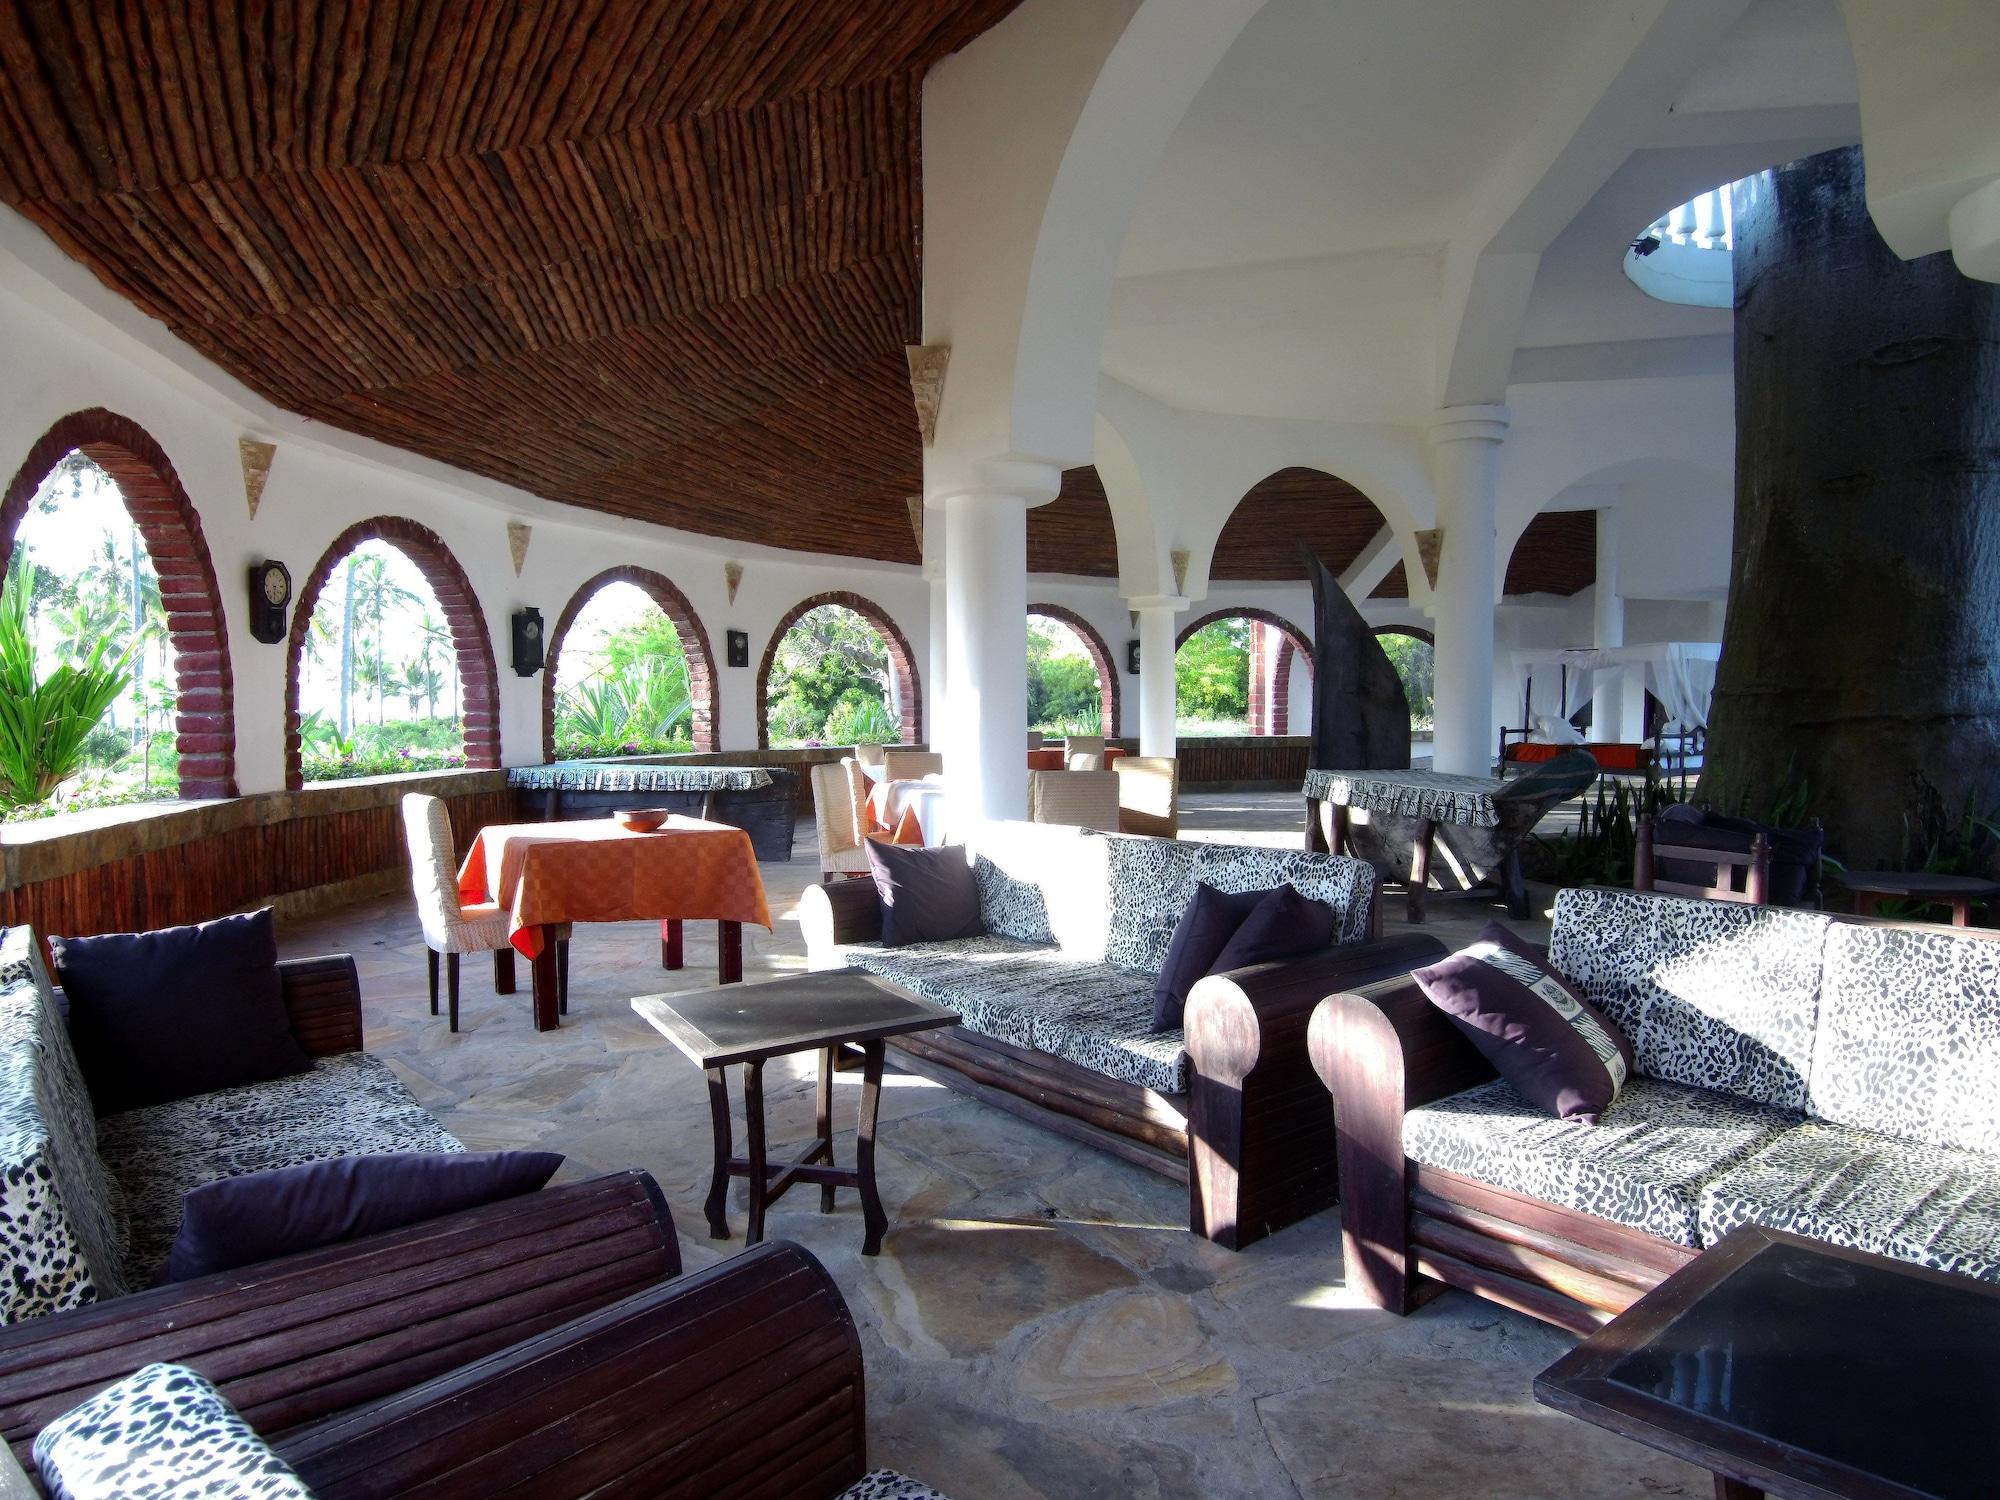 The Vagabond Lodge, Pangani